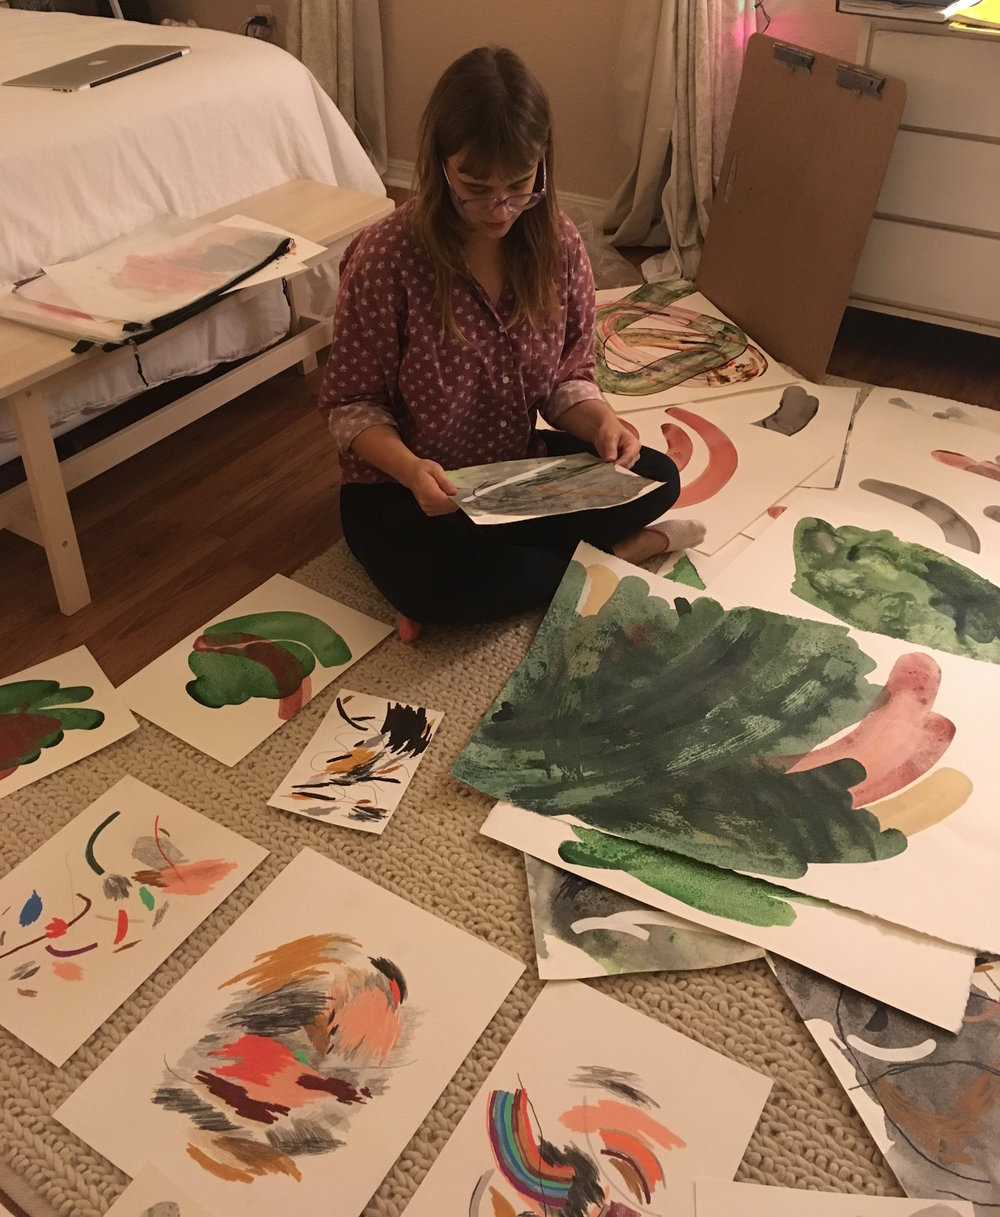 Jackie_Juaristi_Work-at-home-process.JPG